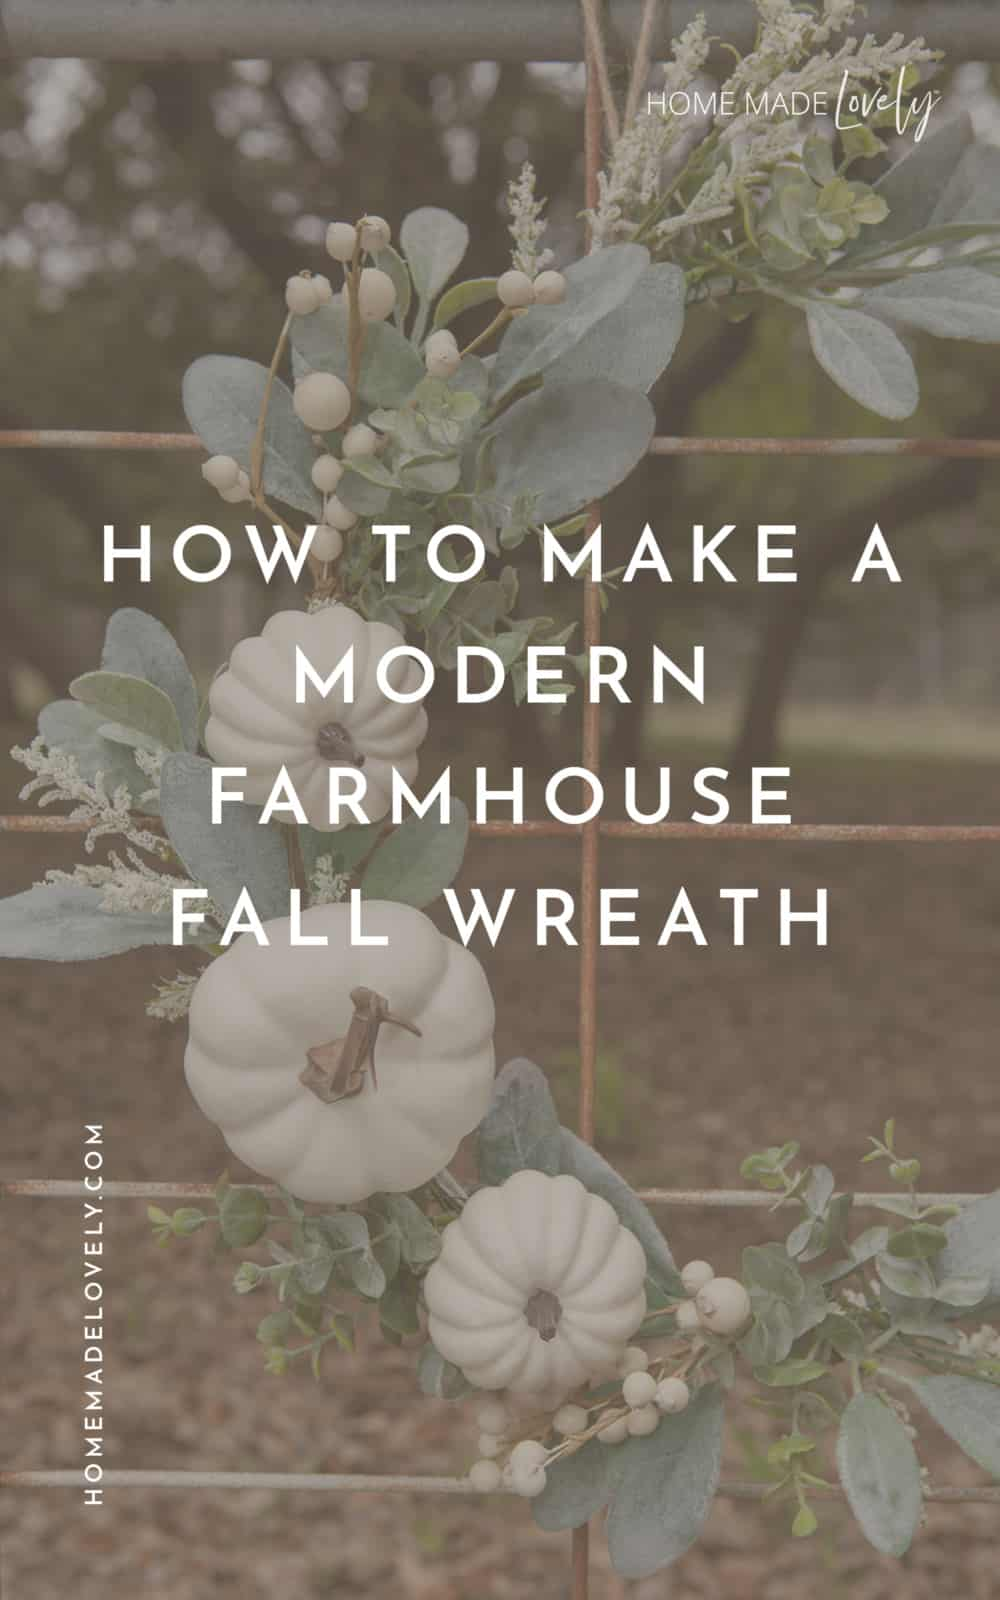 how to make a modern farmhouse fall wreath text over wreath photo